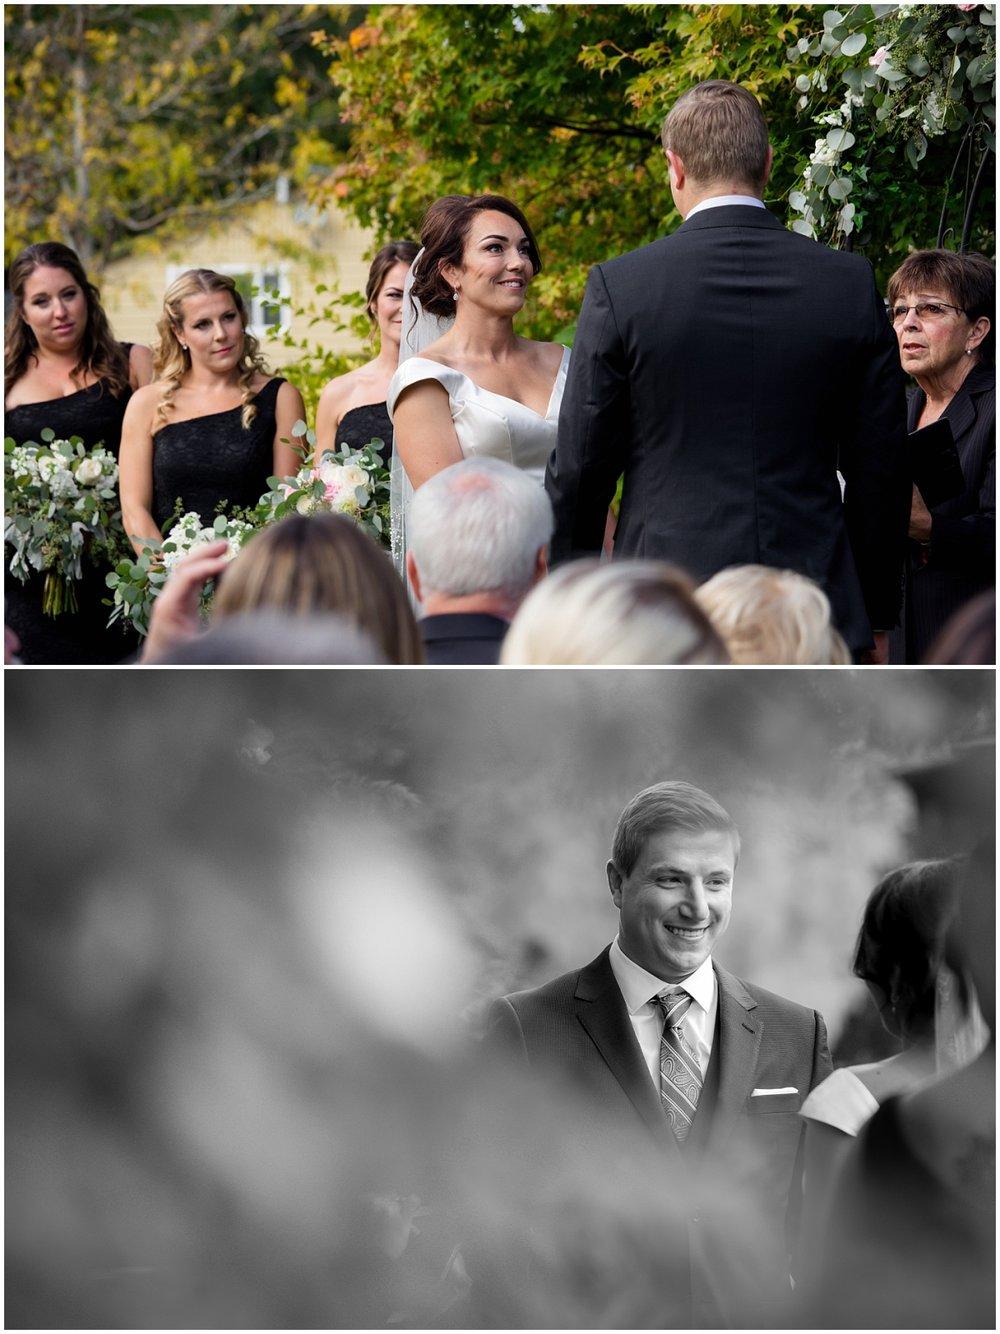 Amazing Day Photography - Langley Wedding Photographer - Tsawwassen Wedding Photographer - Beach Grove Golf Course Wedding - Tsawwassen Wedding